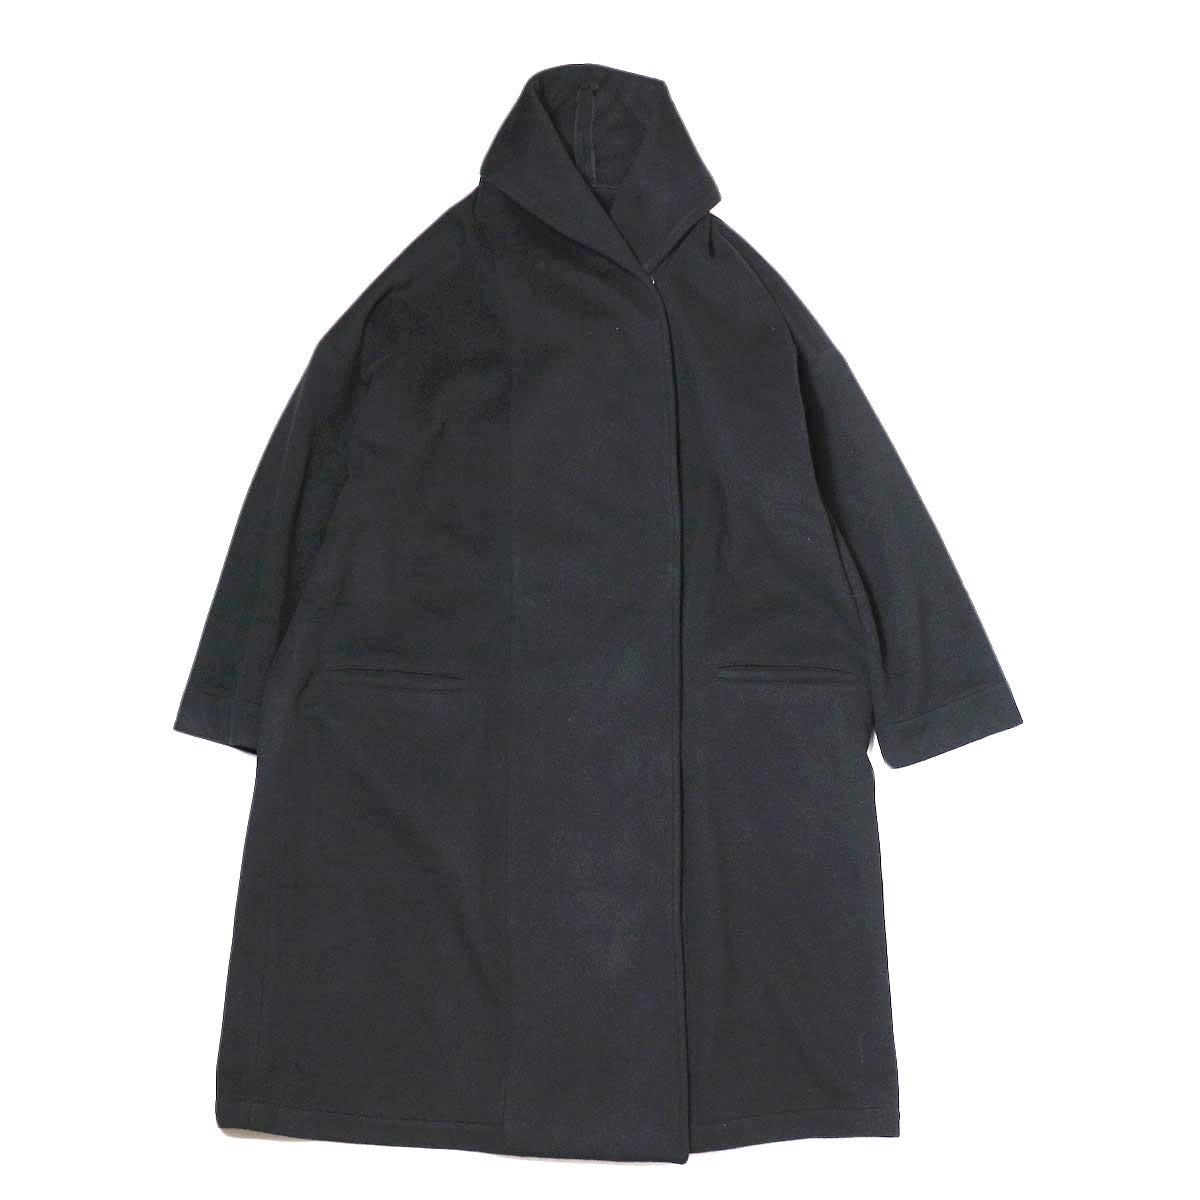 Honnete / Shawl Collar Wide Coat (Black)